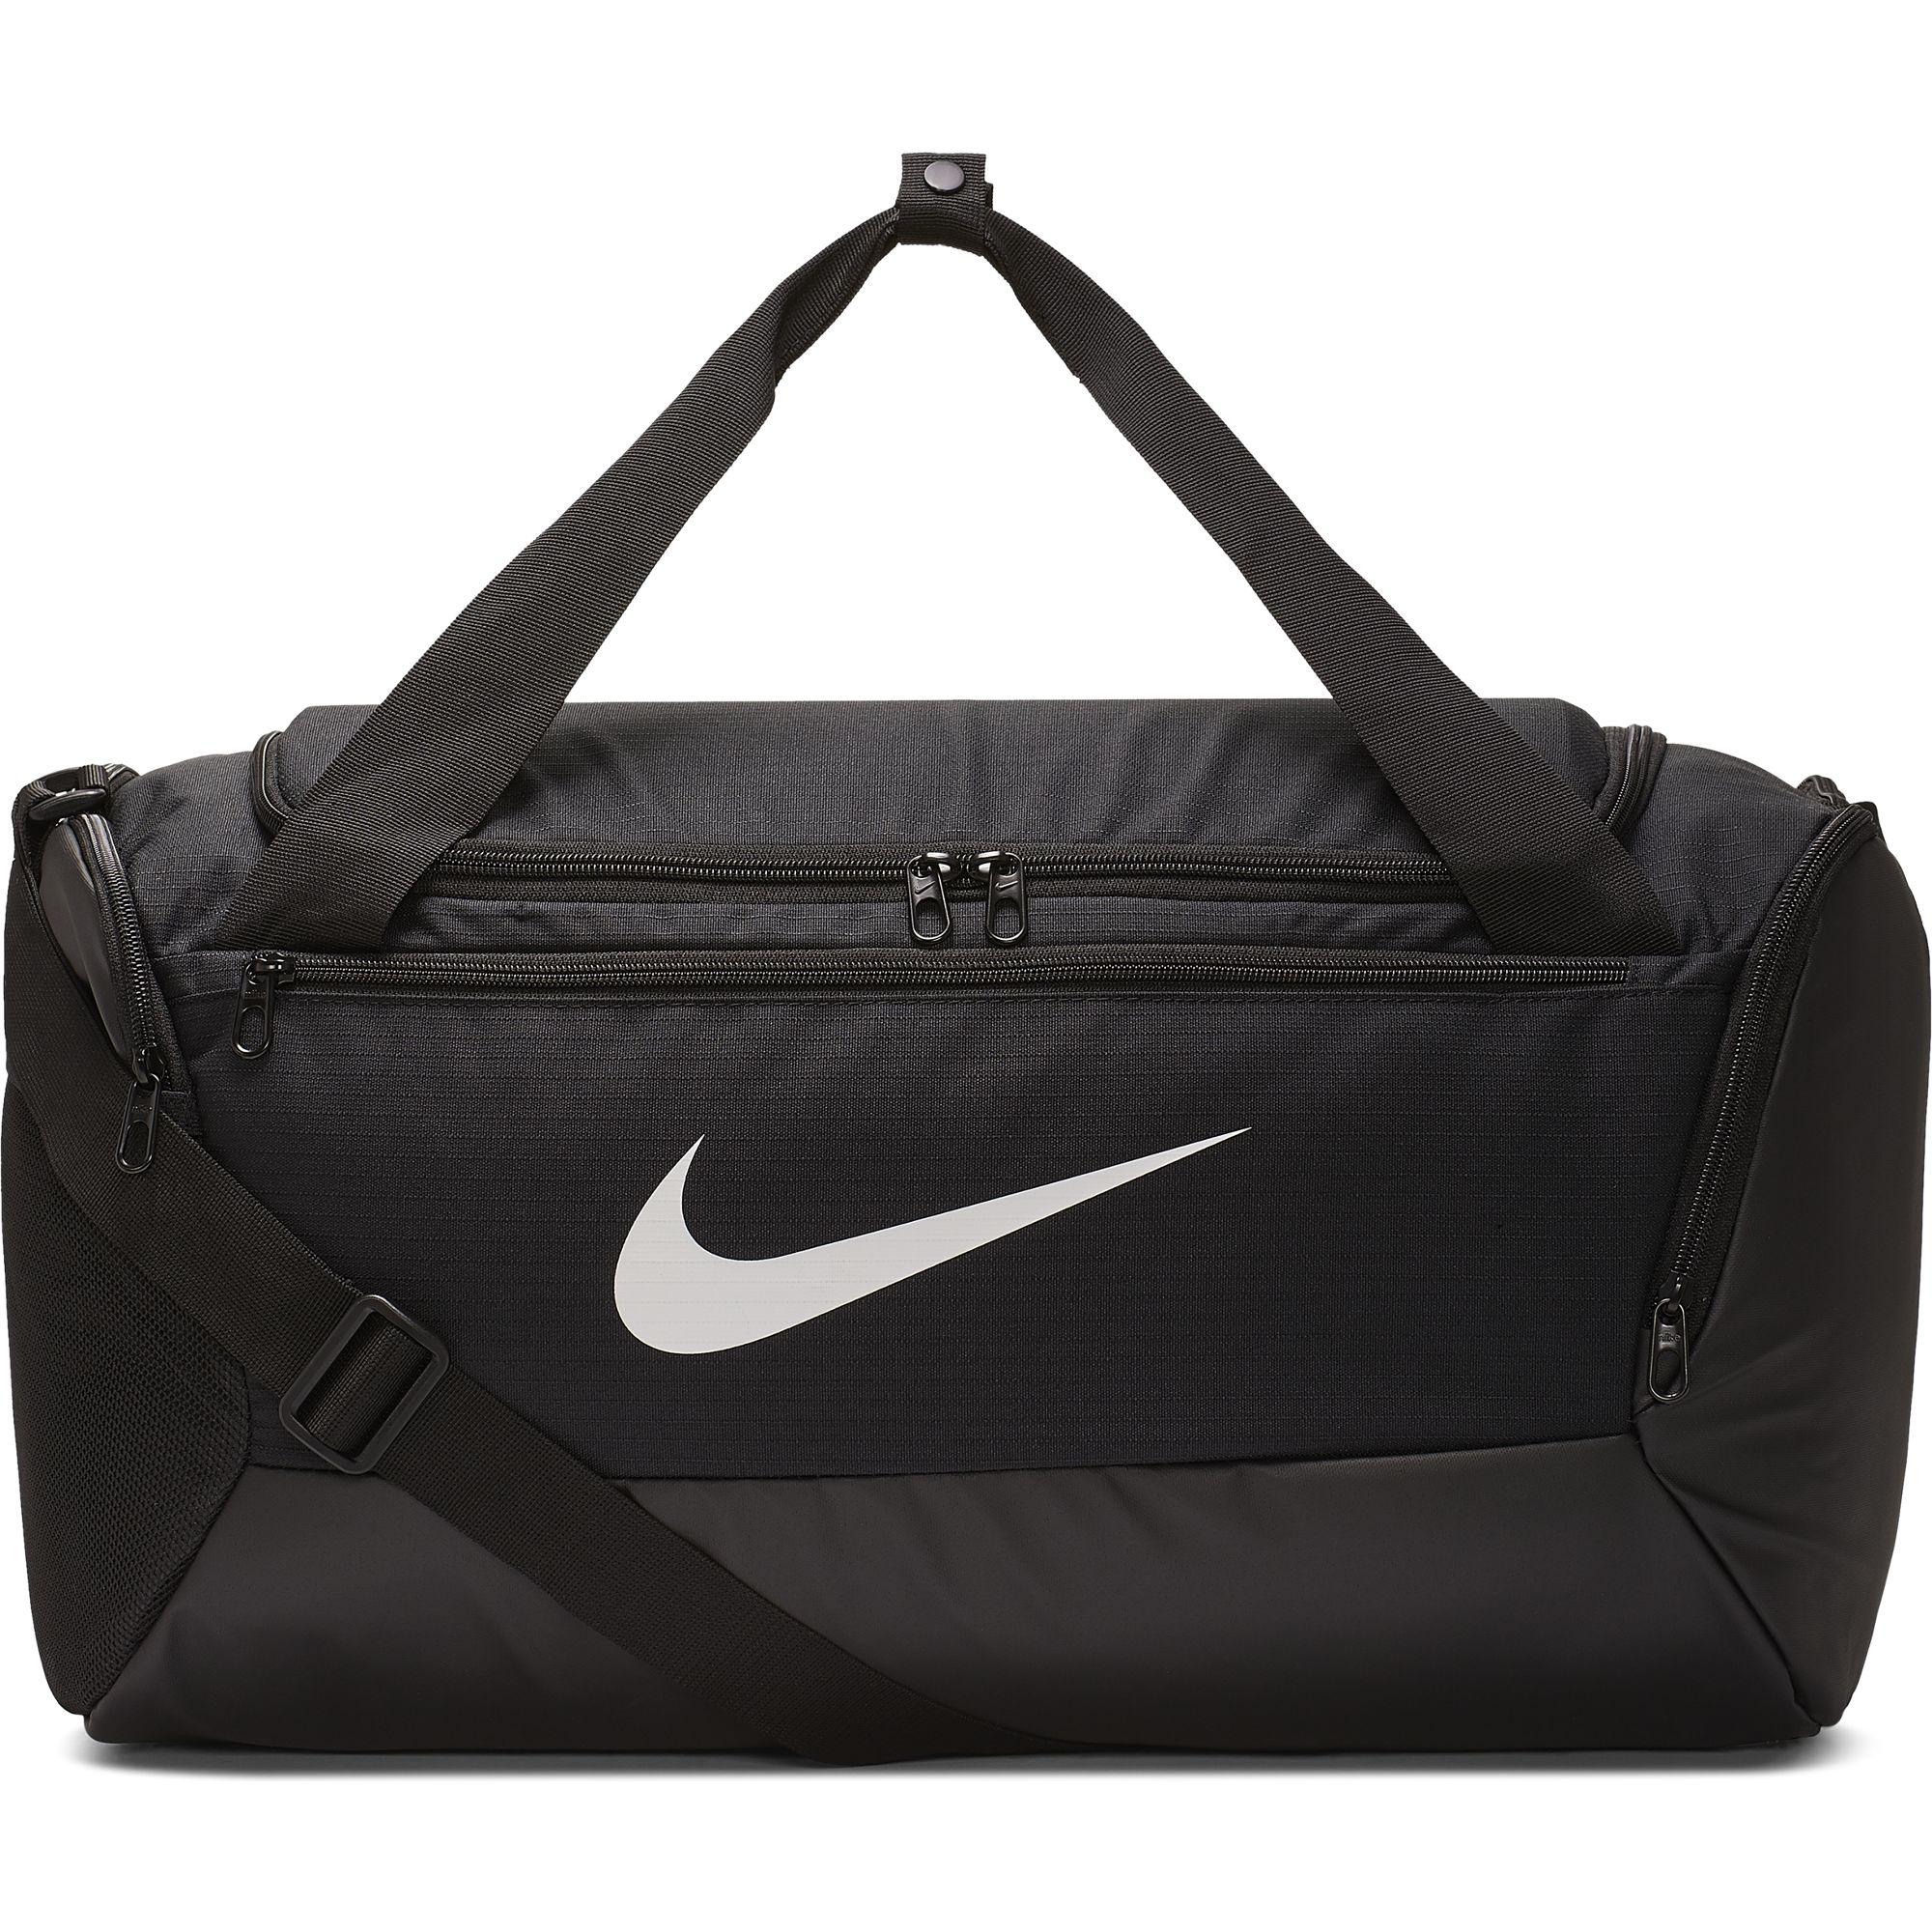 Brasilia Small Training Duffell Bag, Black/Black, swatch